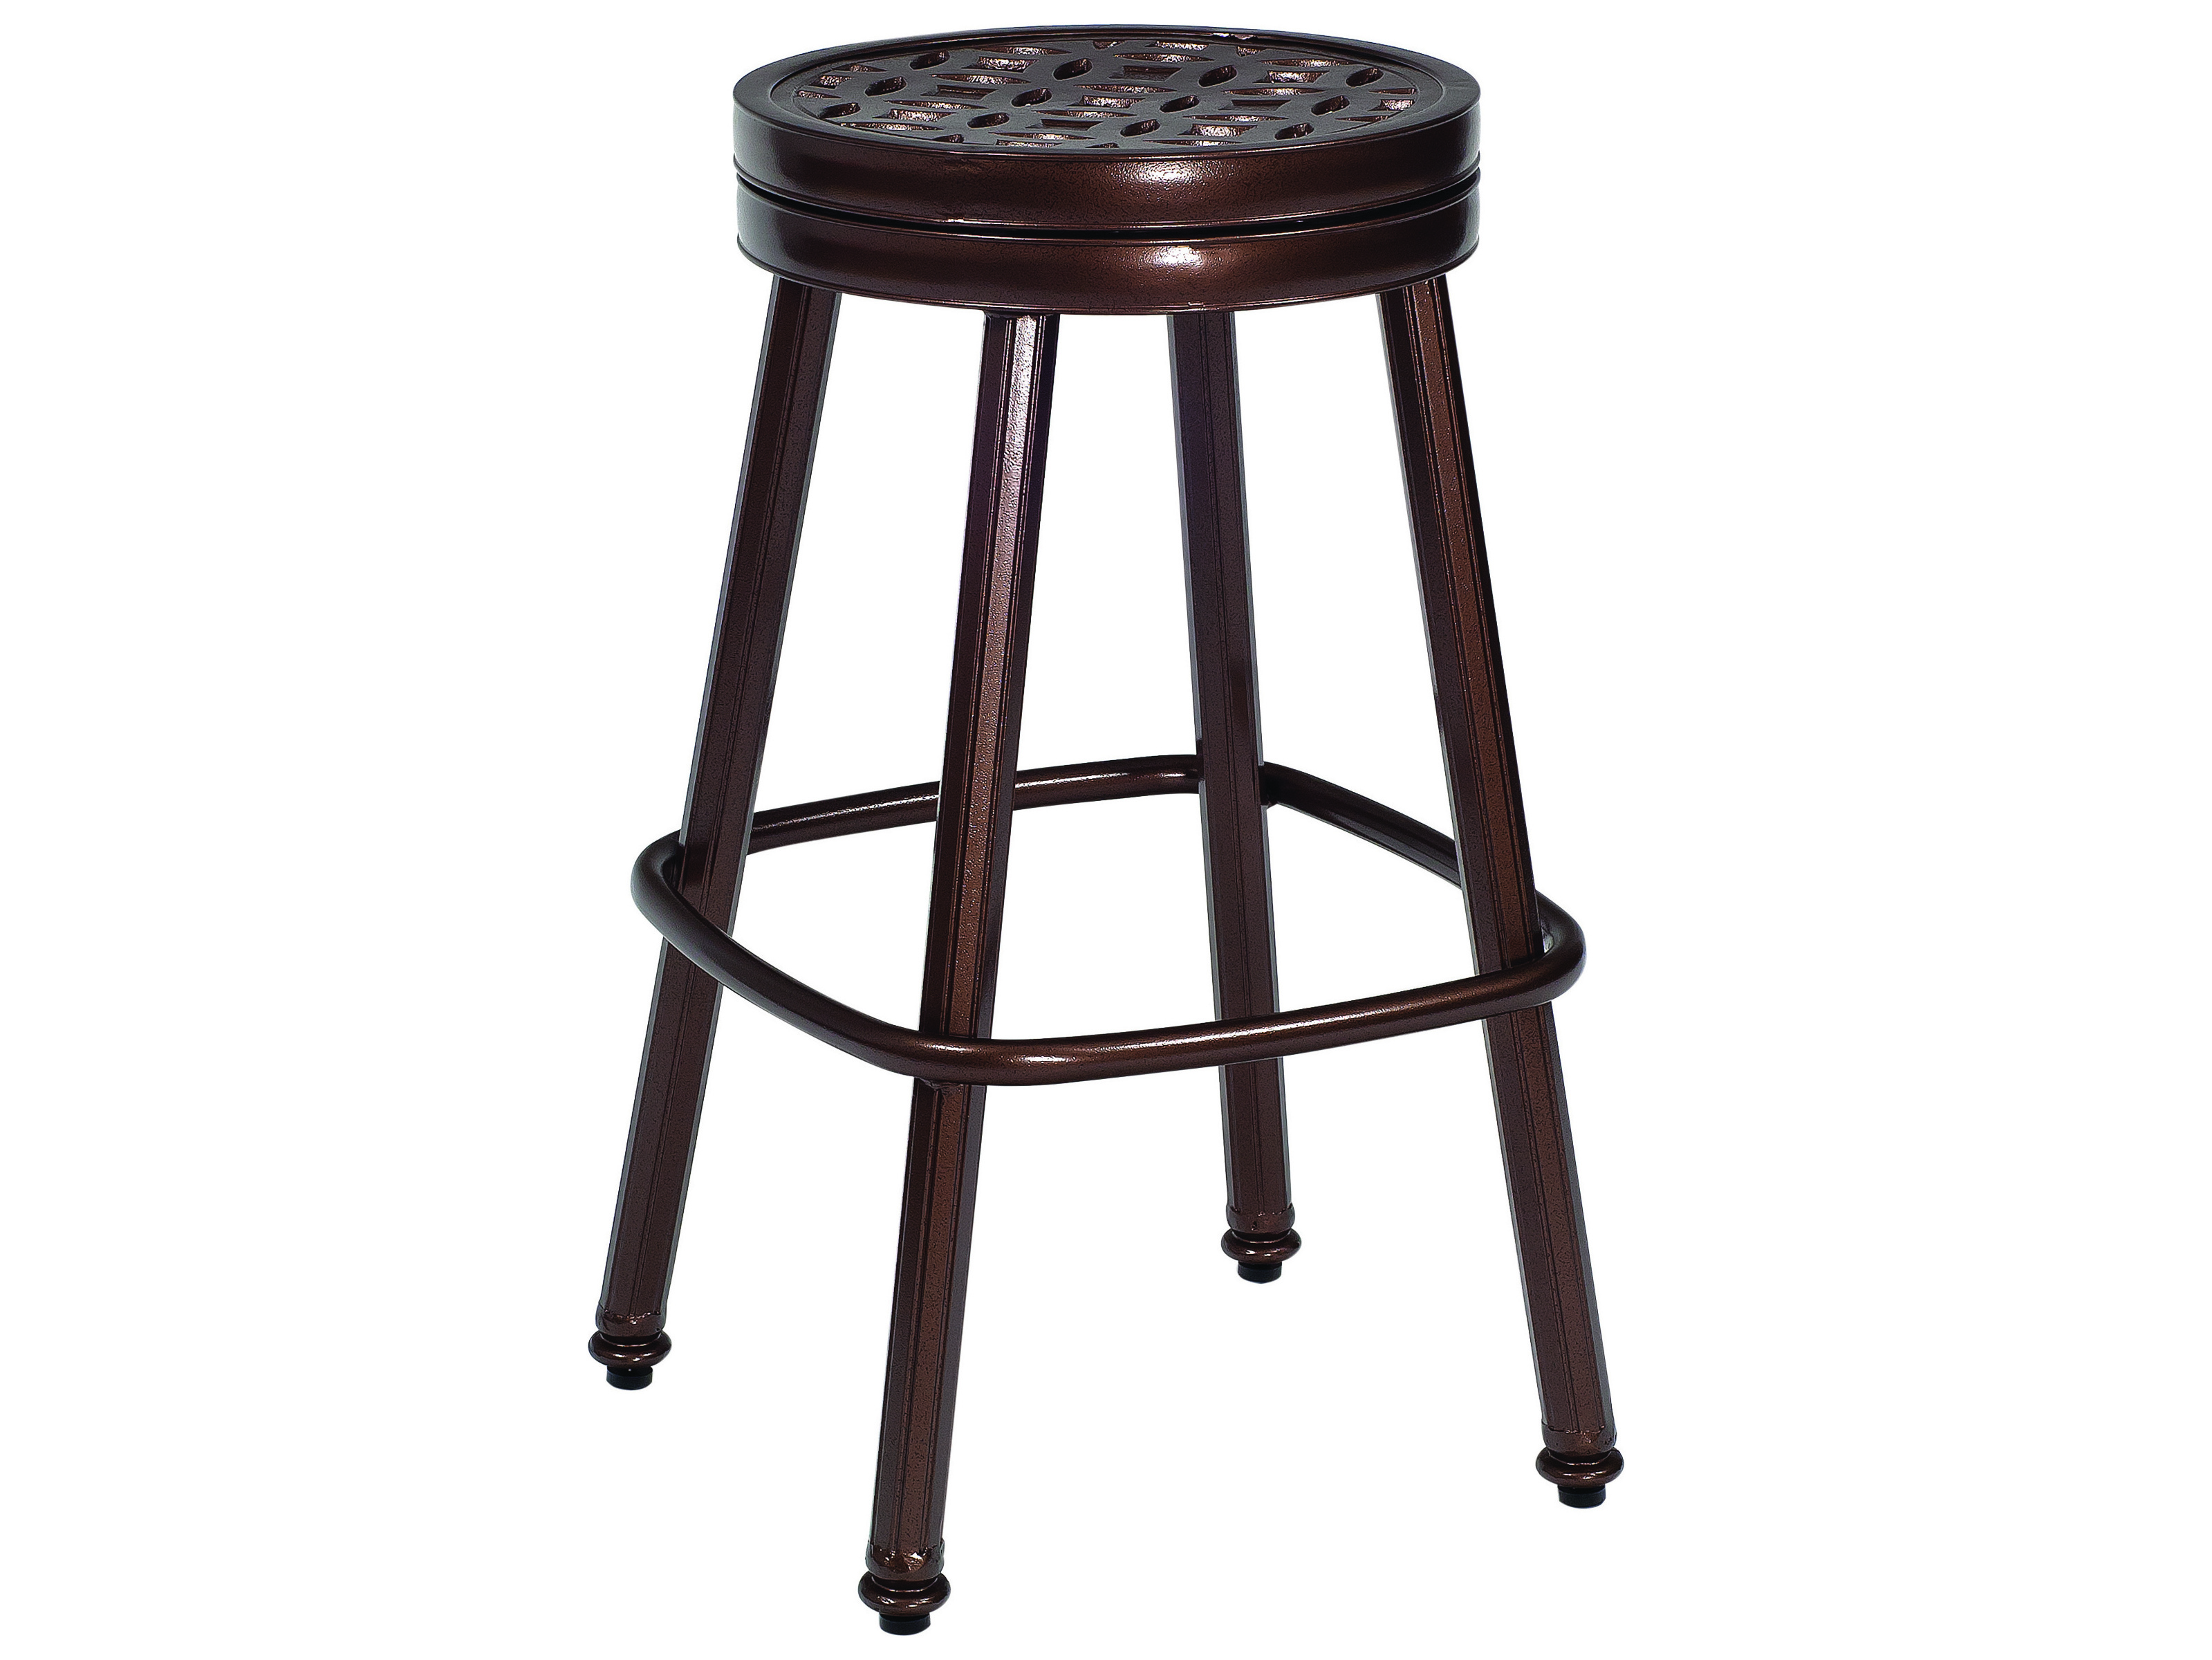 Woodard Casa Cast Aluminum Round Swivel Bar Stool 3y0668